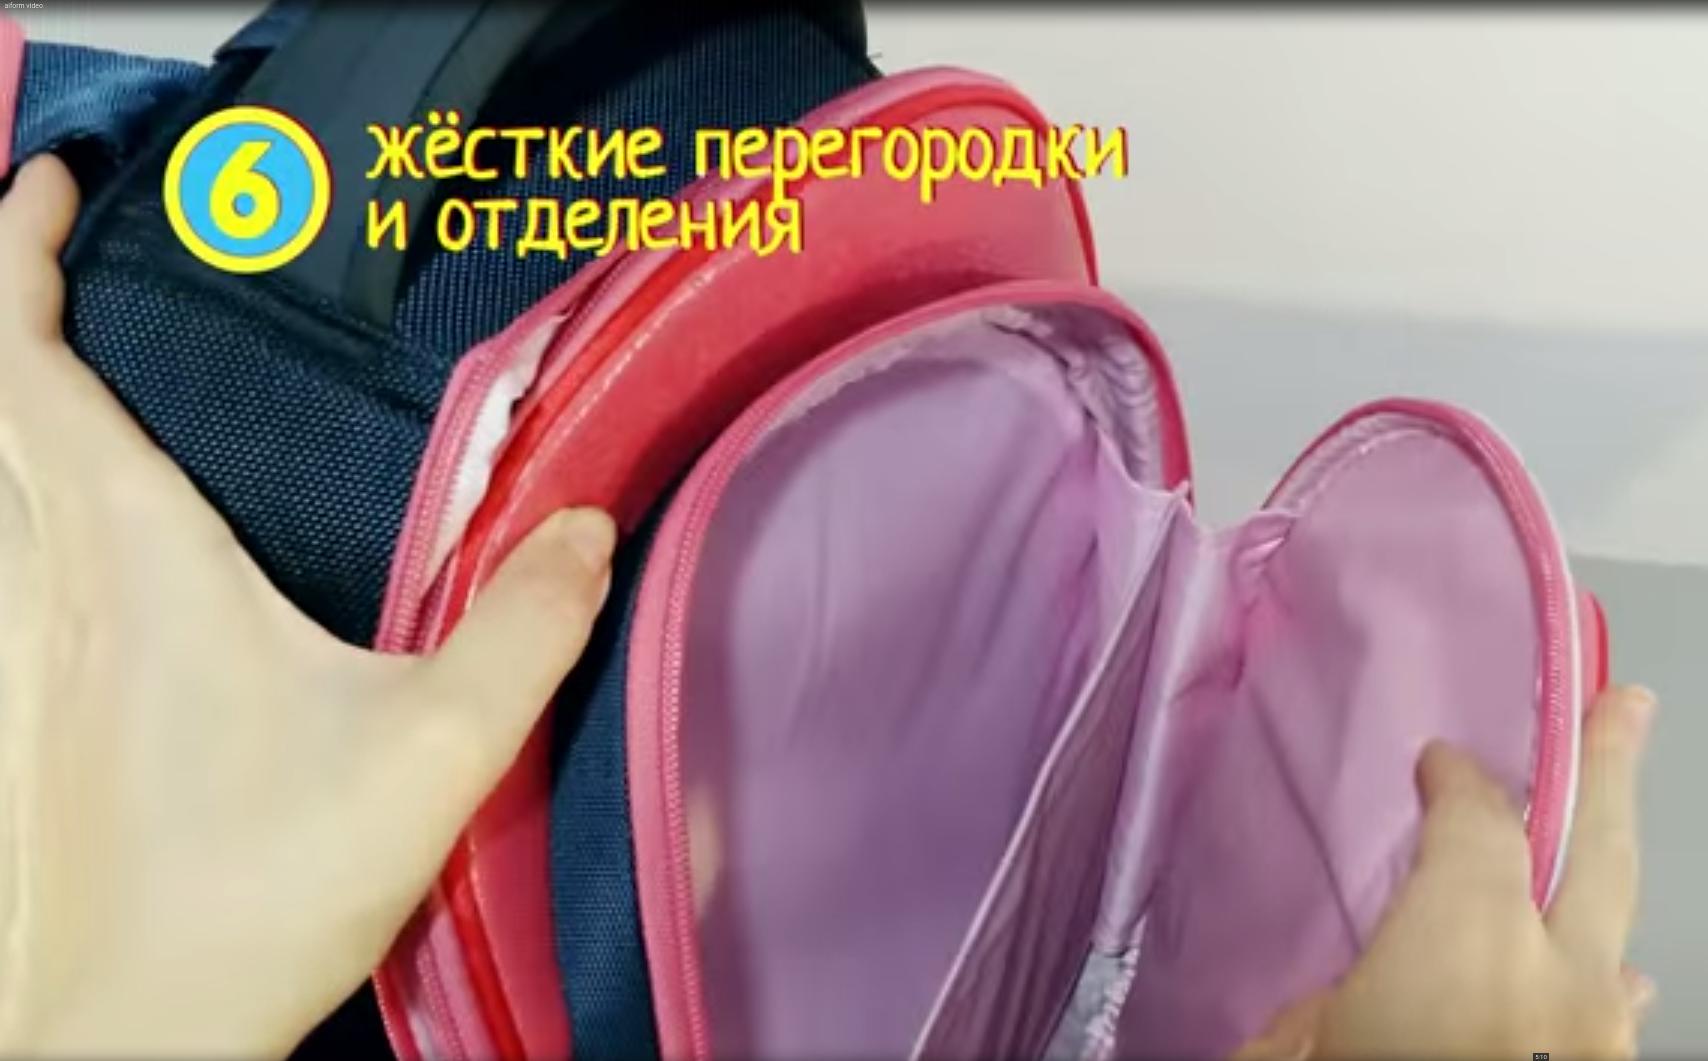 Ранец для первоклассника Hummingbird TK27 Футбол серый с мешком для обуви + пенал, - фото 8